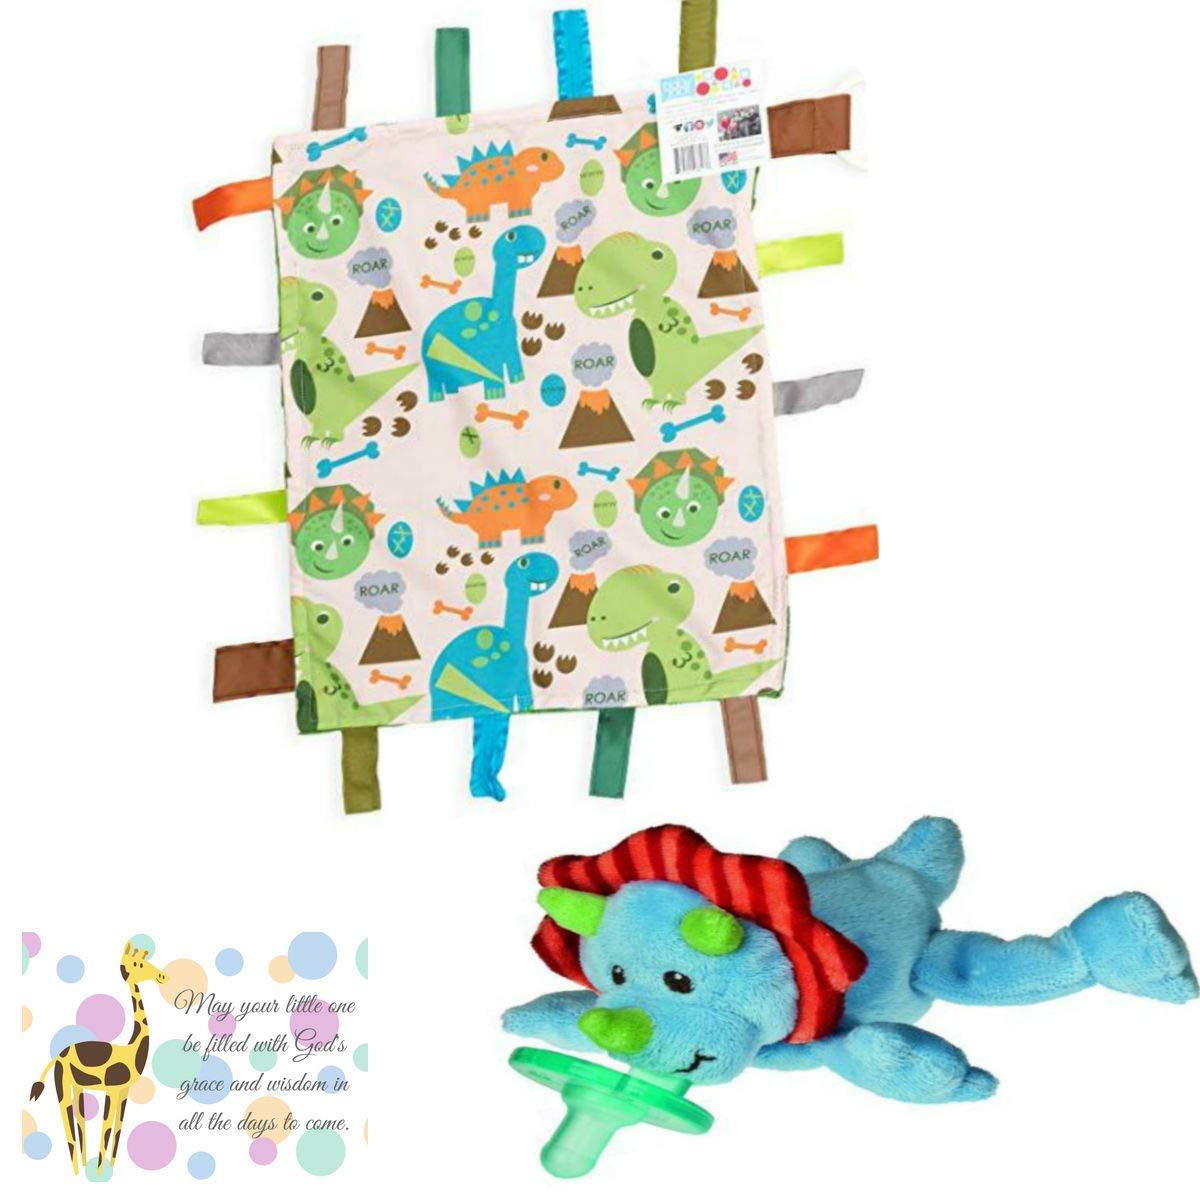 Mary Meyer Dino Wubbanub, Sensory Dinosaur Learning Lovey and Mini Gift Card Baby Gift Bundle-3 Items by Bigdream